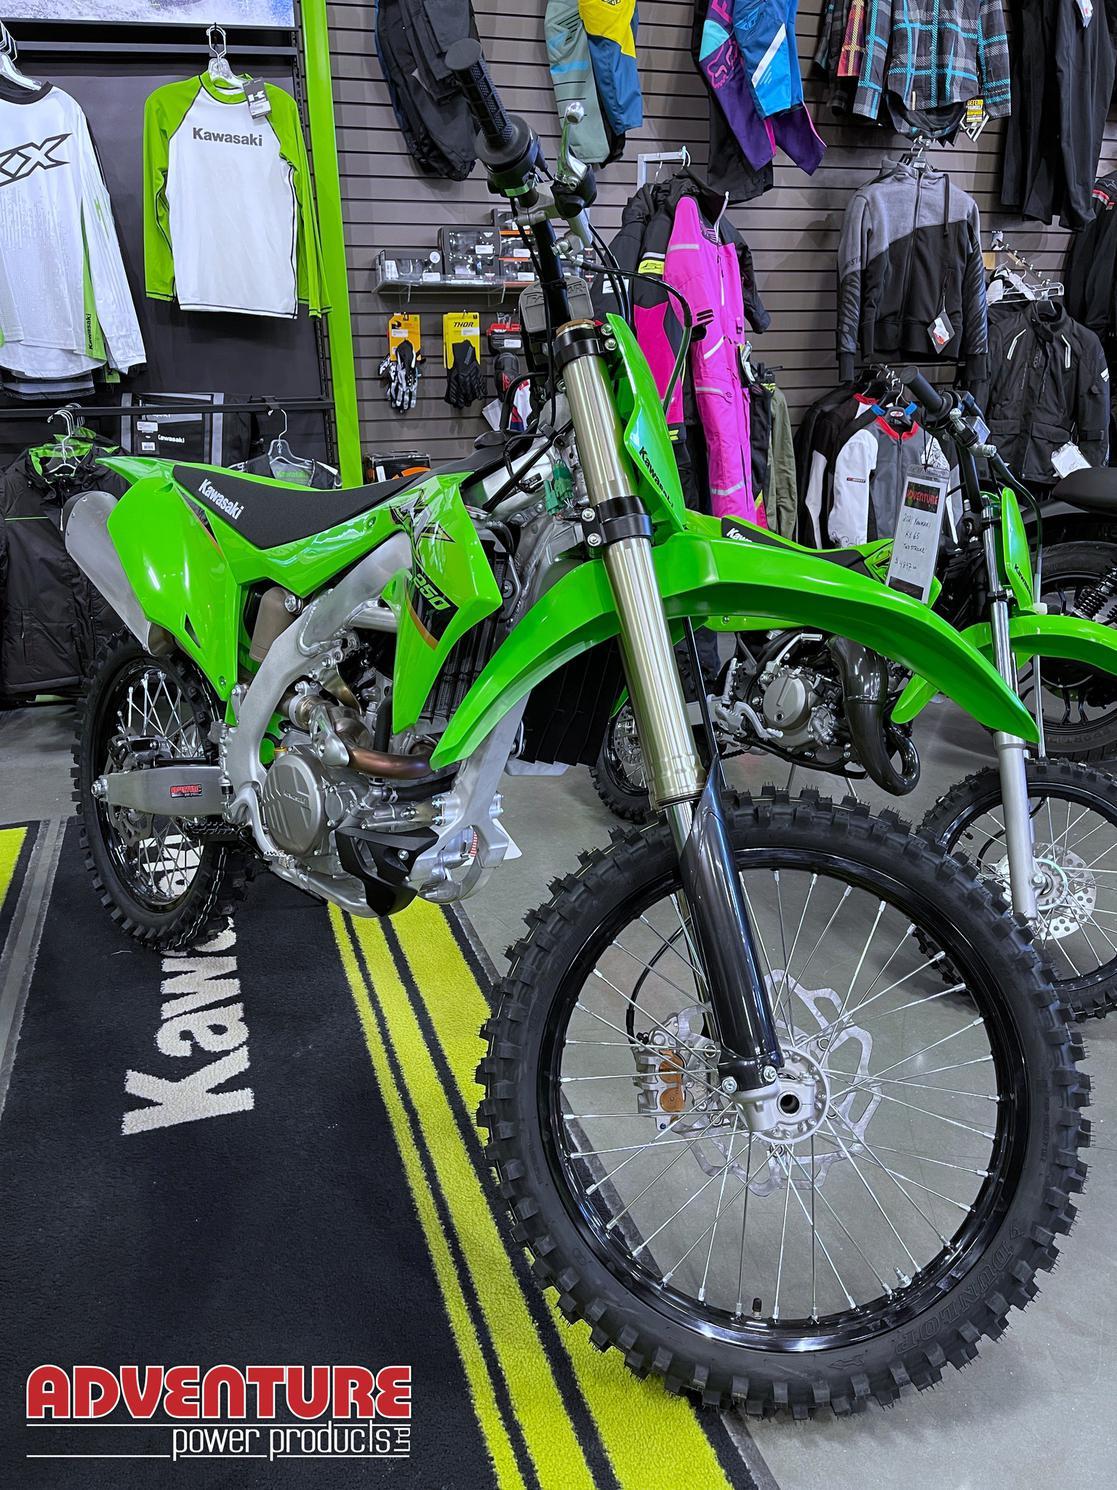 2022 Kawasaki KX250 - ON ORDER